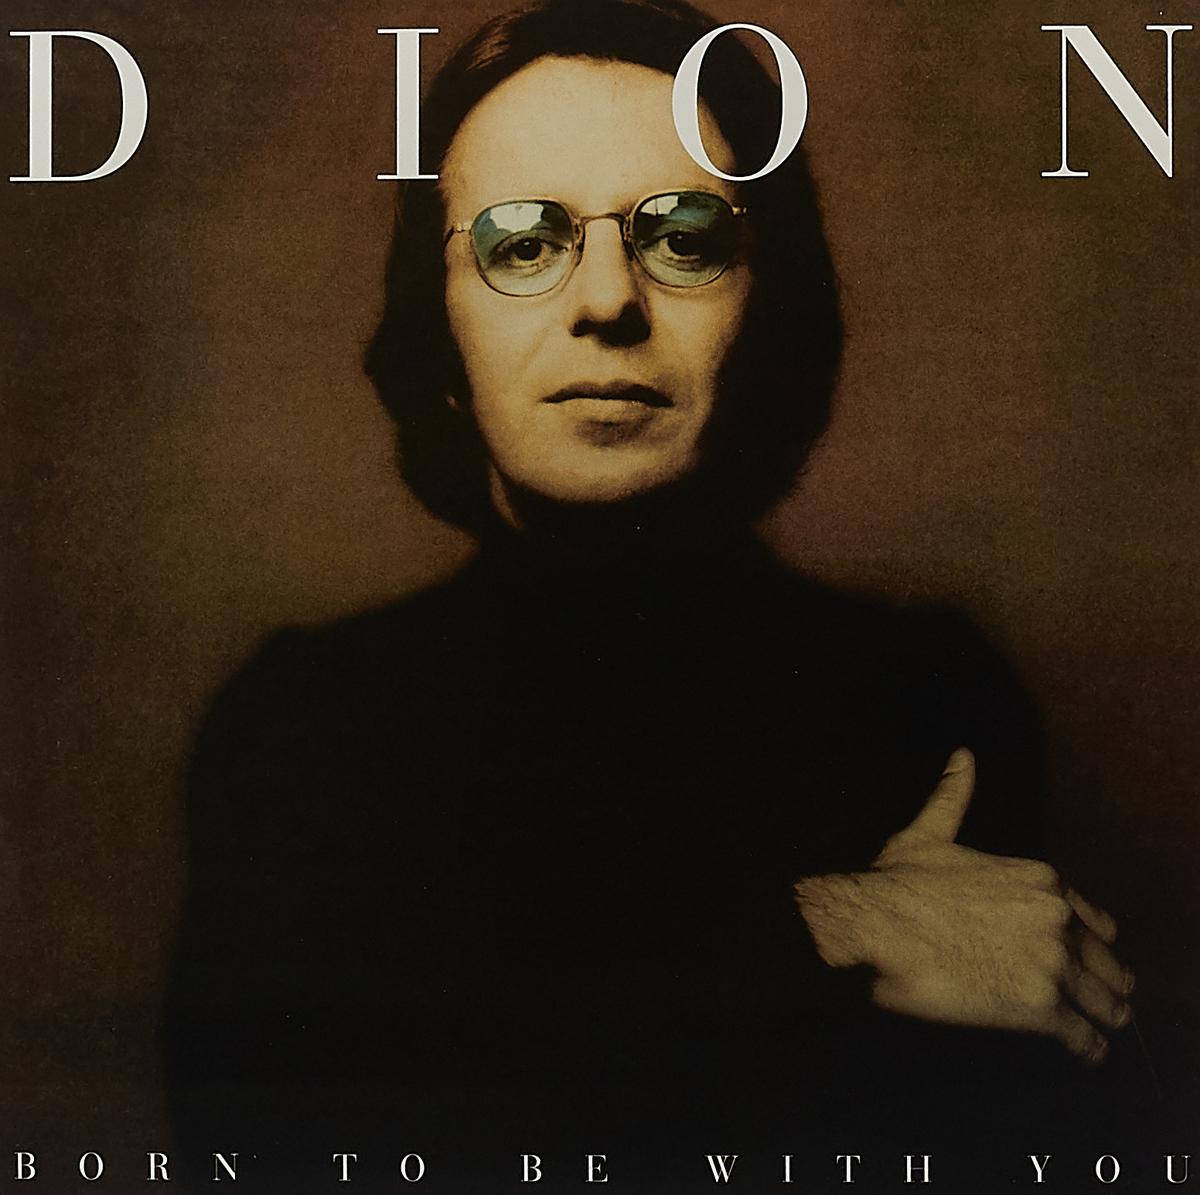 Dion Dion. Born To Be With You (LP) недорго, оригинальная цена